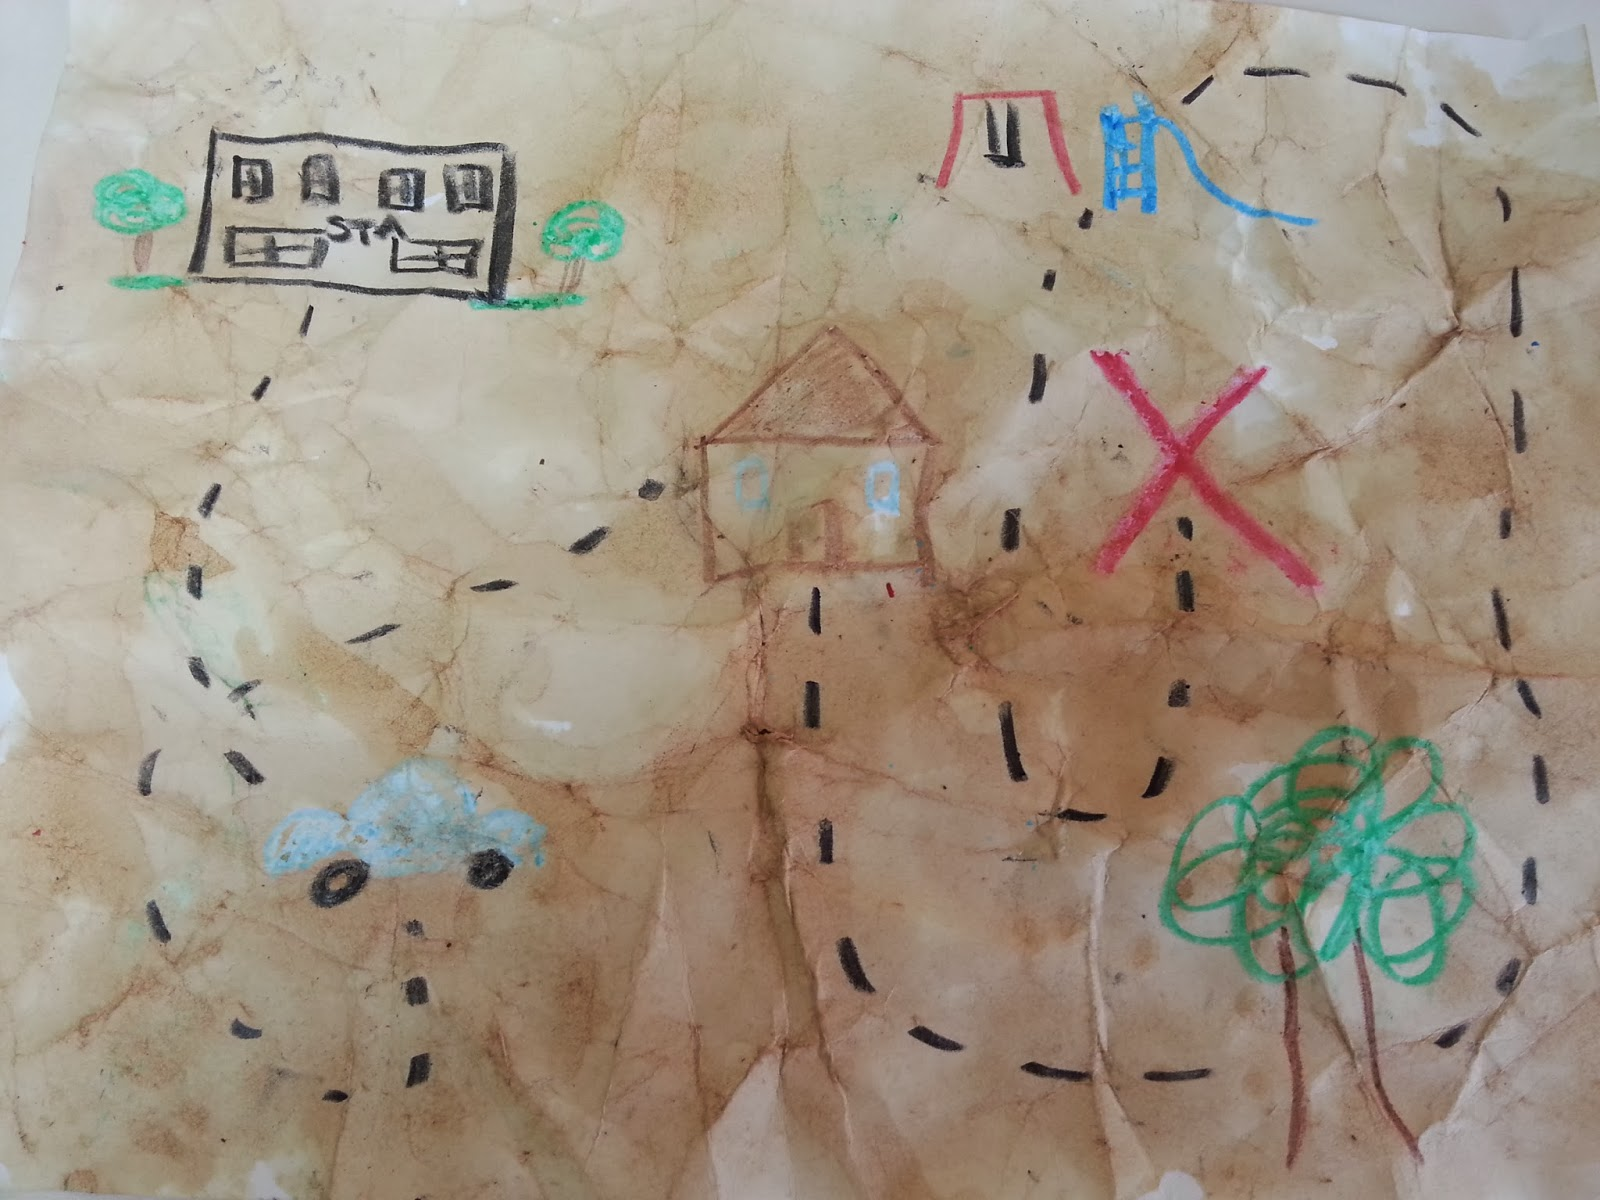 STA Classroom: X Marks The Spot